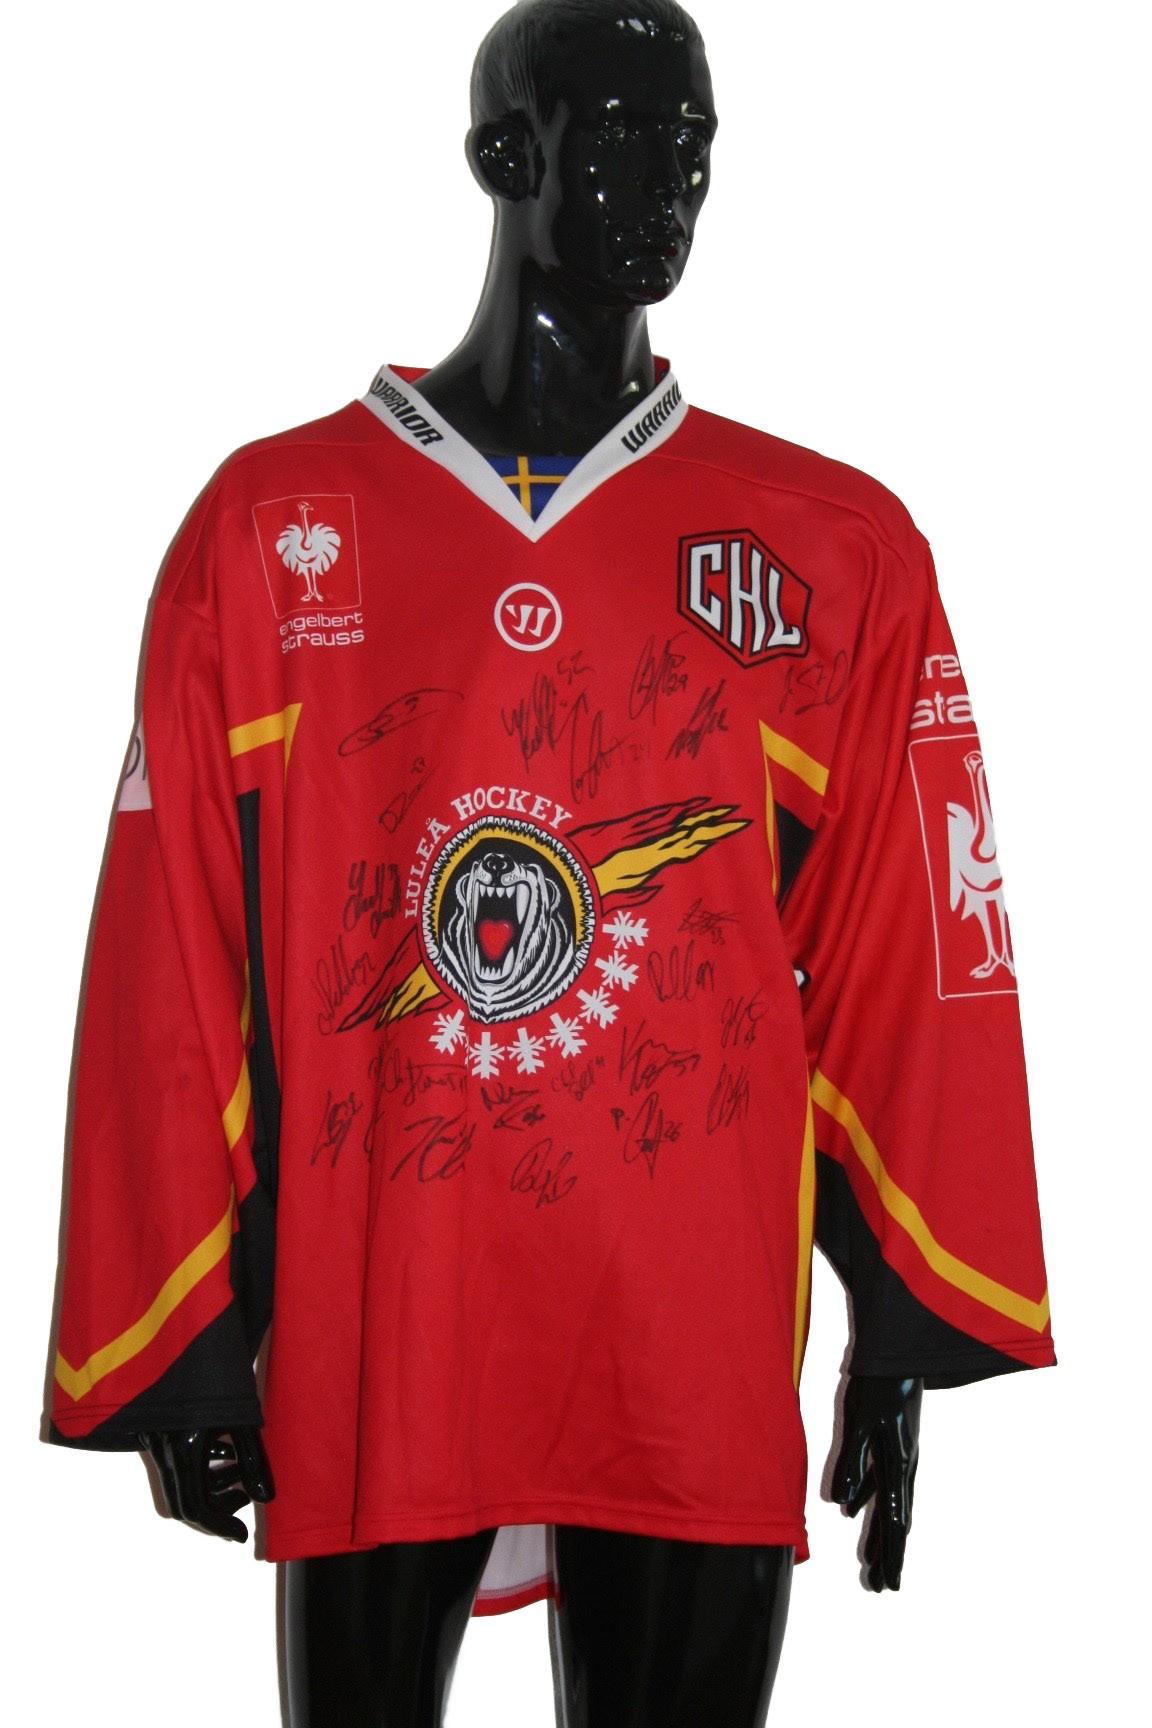 luleå hockey merchandise